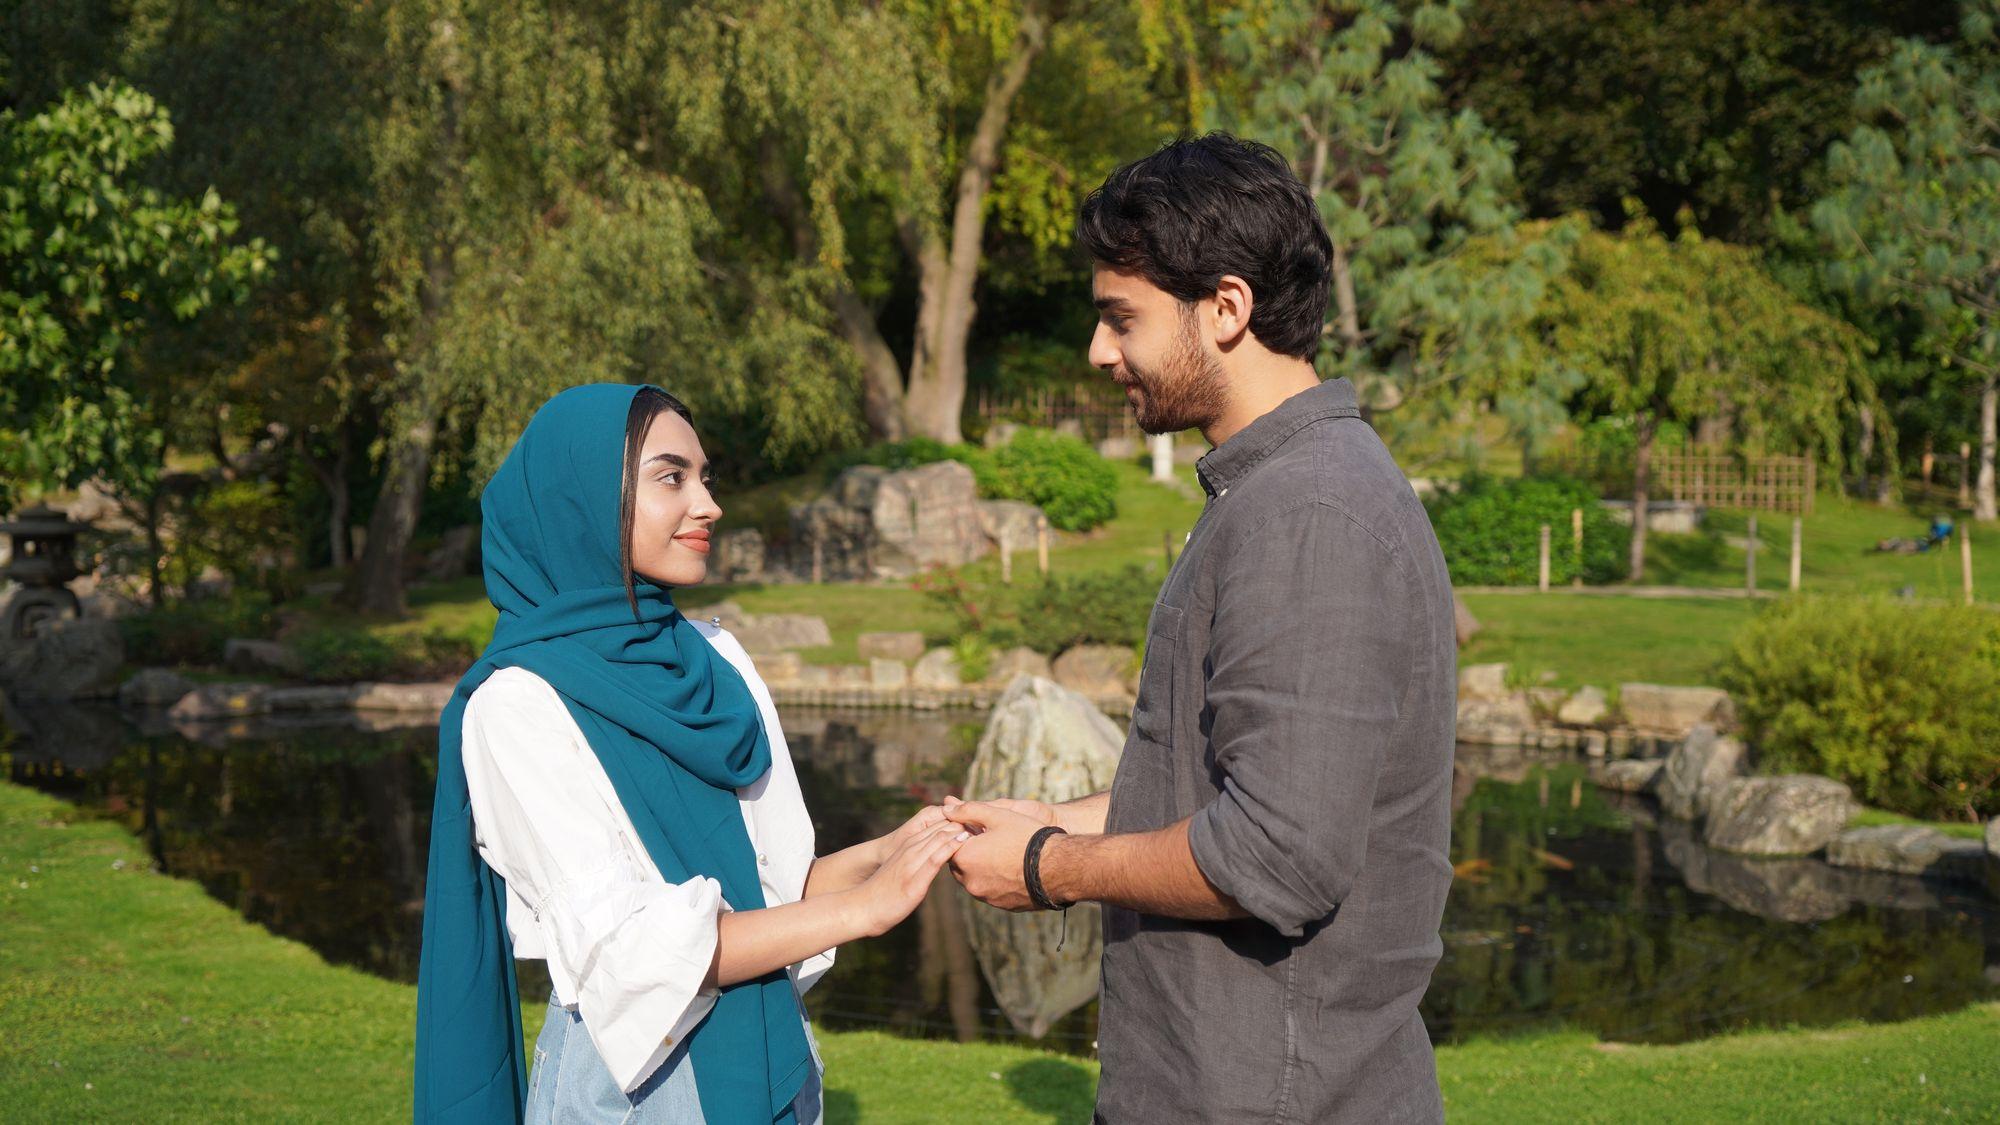 halal dating site